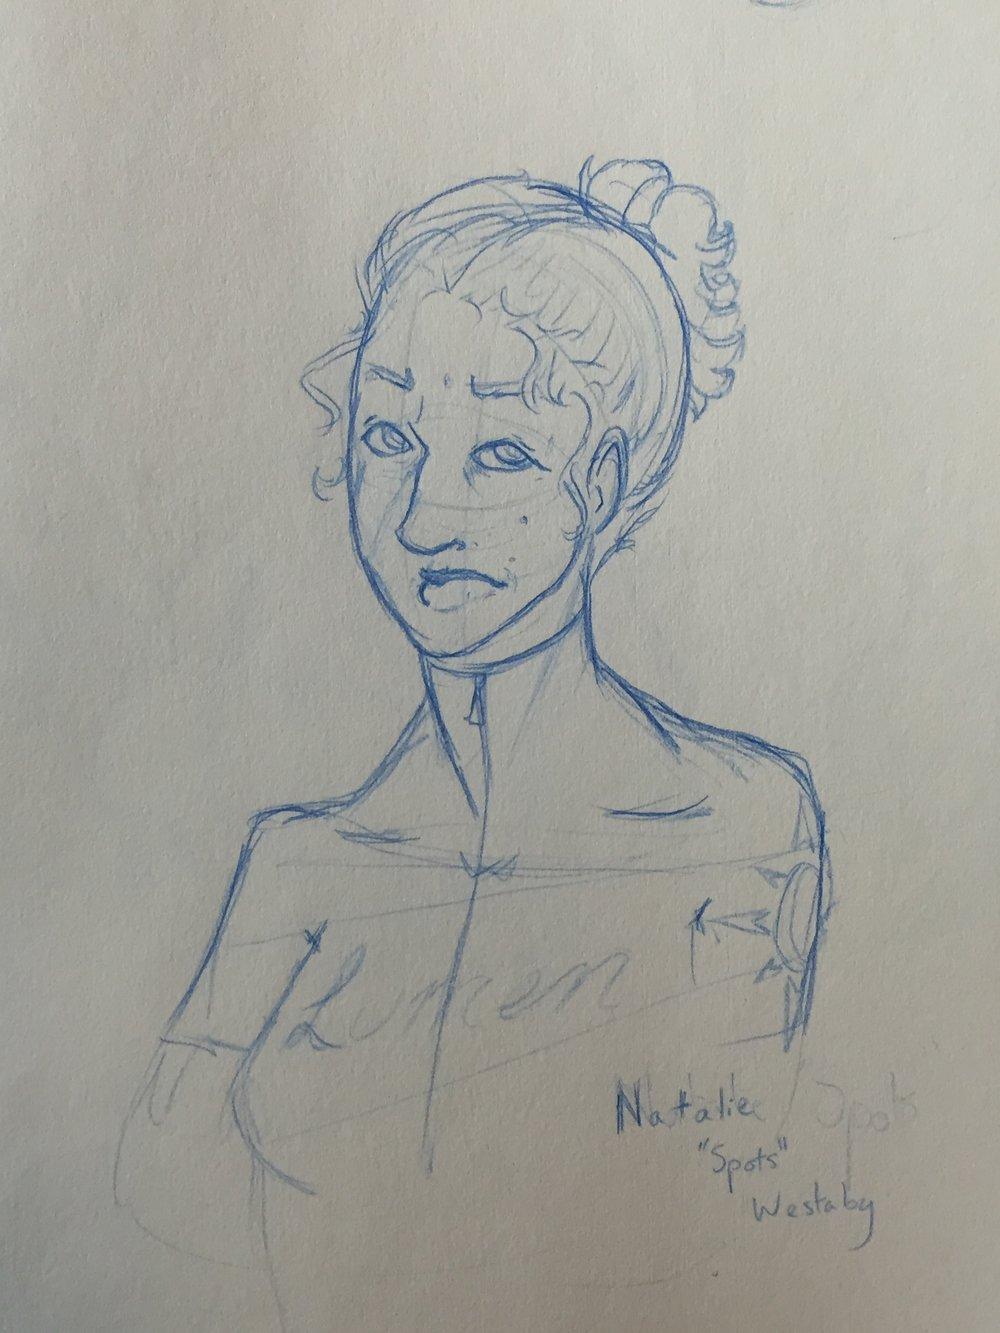 Cartoon self-portrait